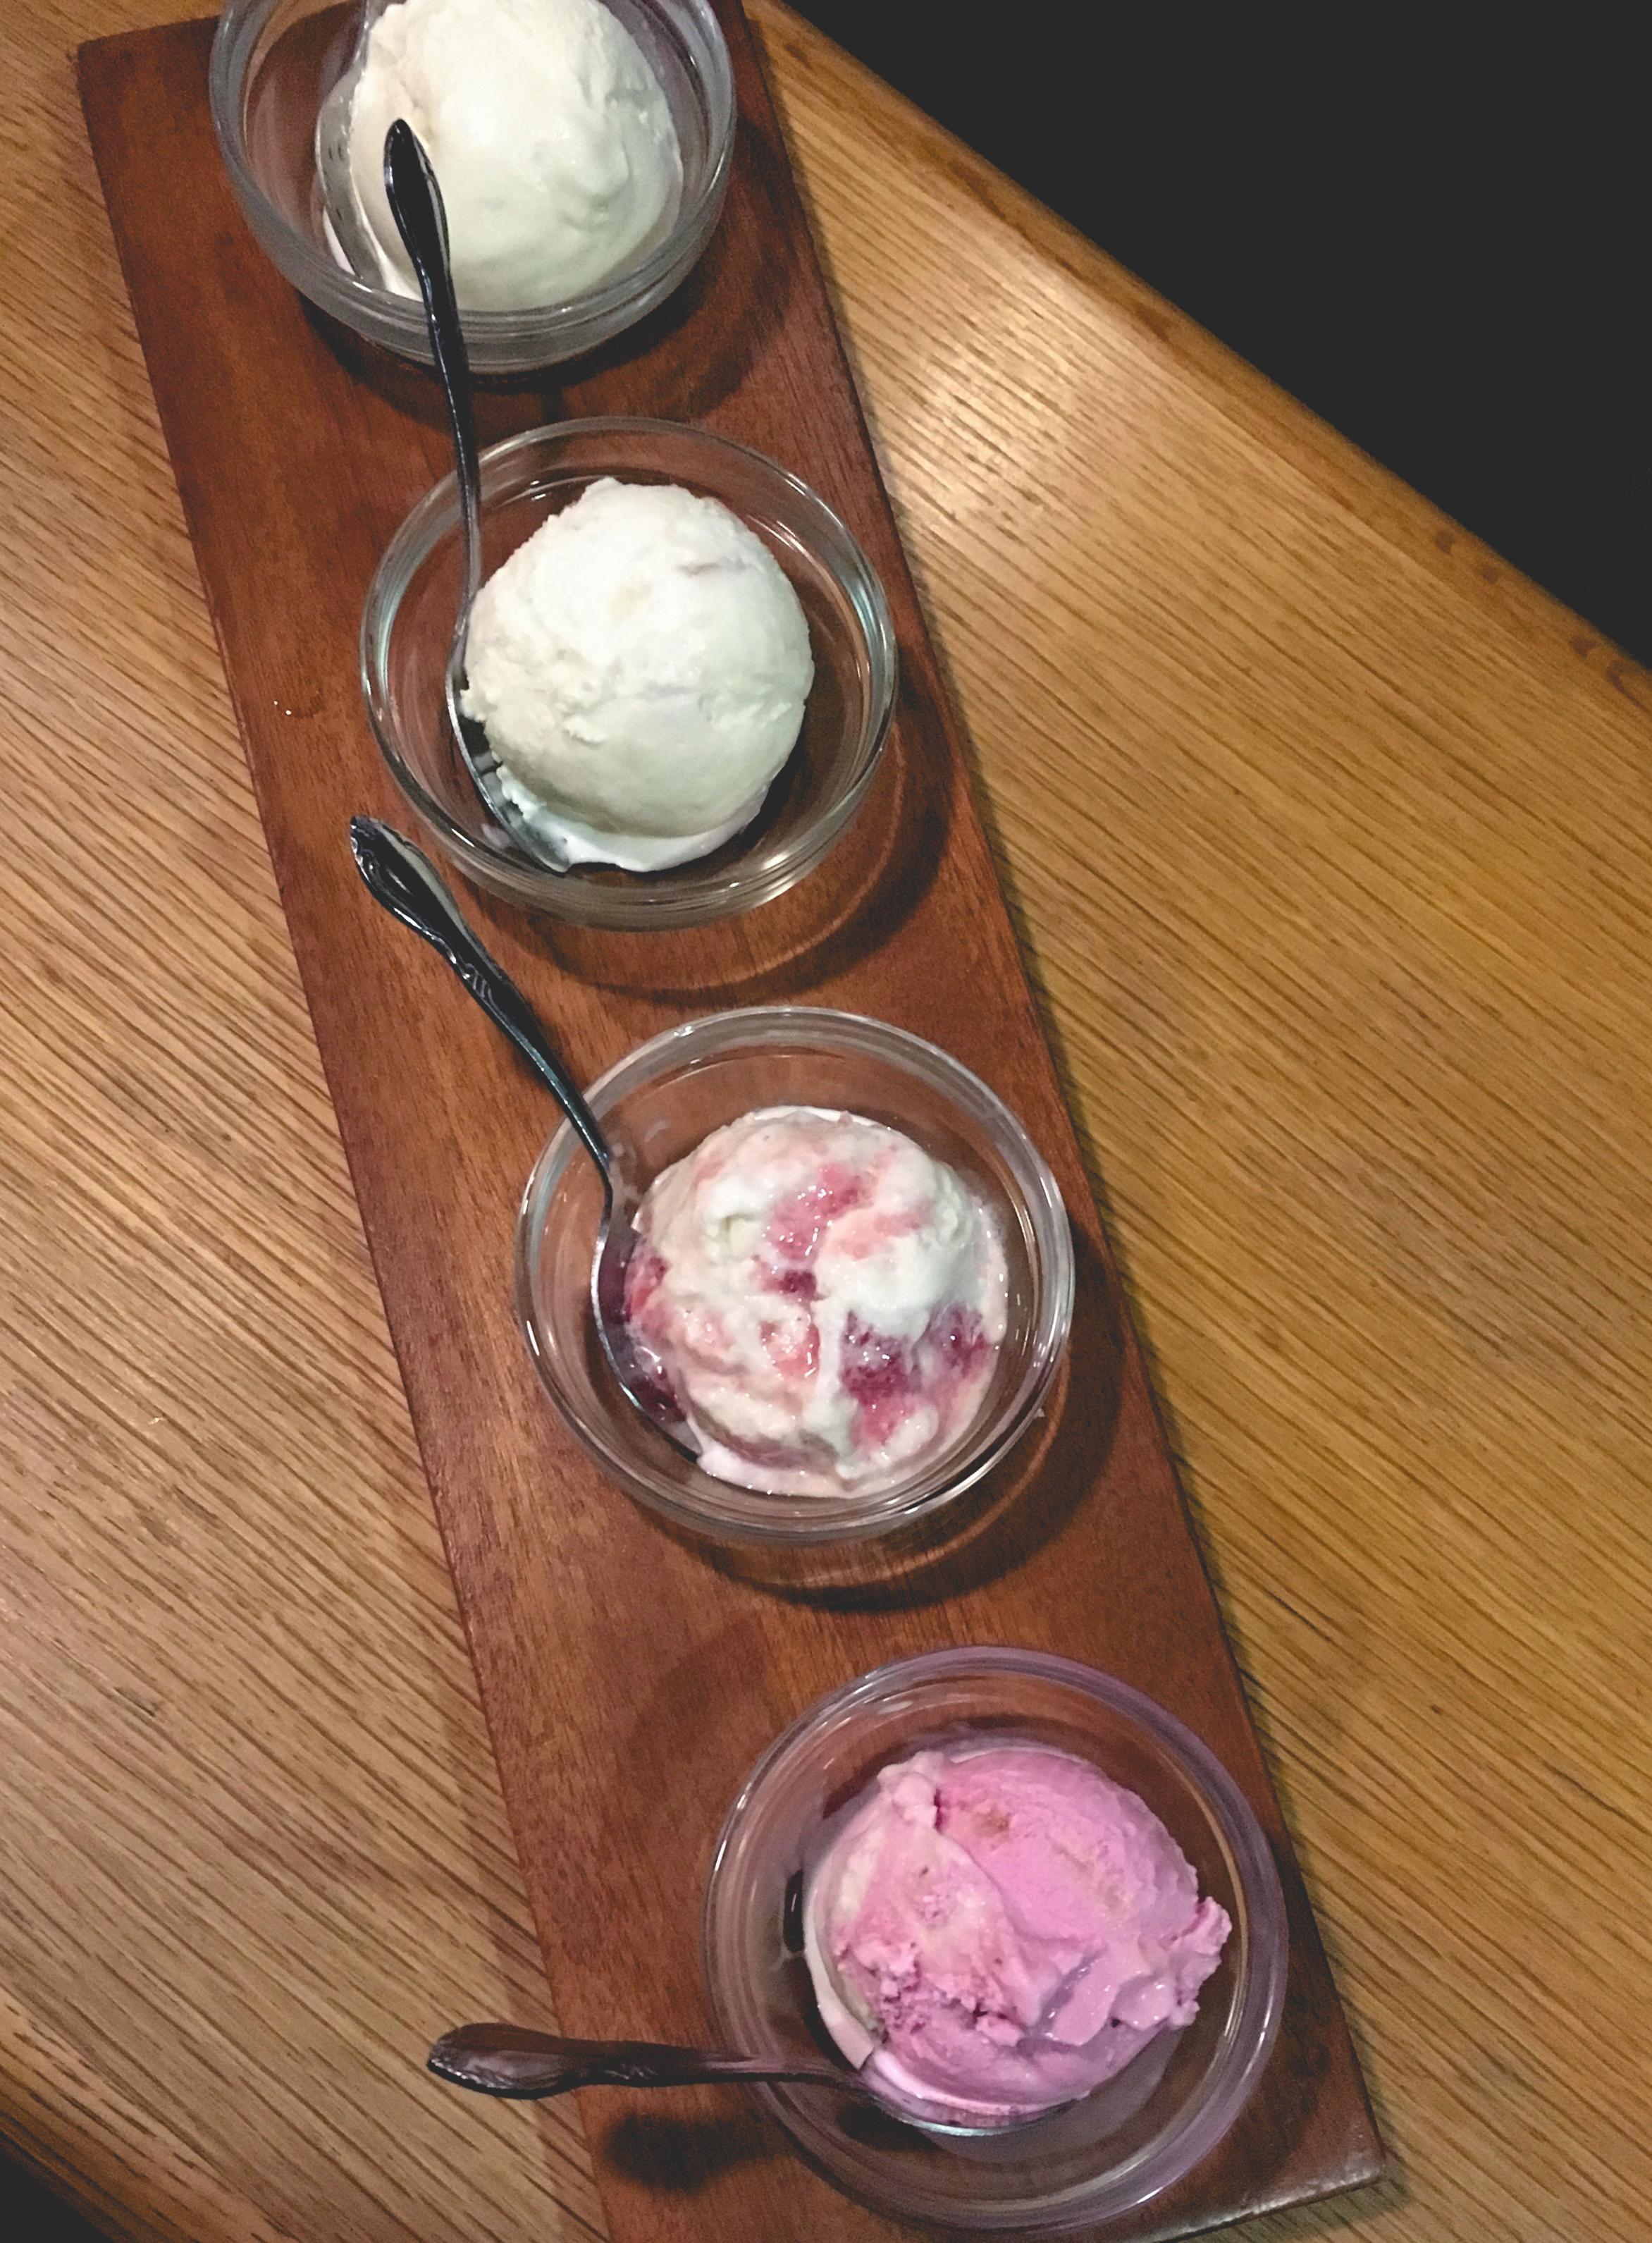 salt-and-straw-ice-cream